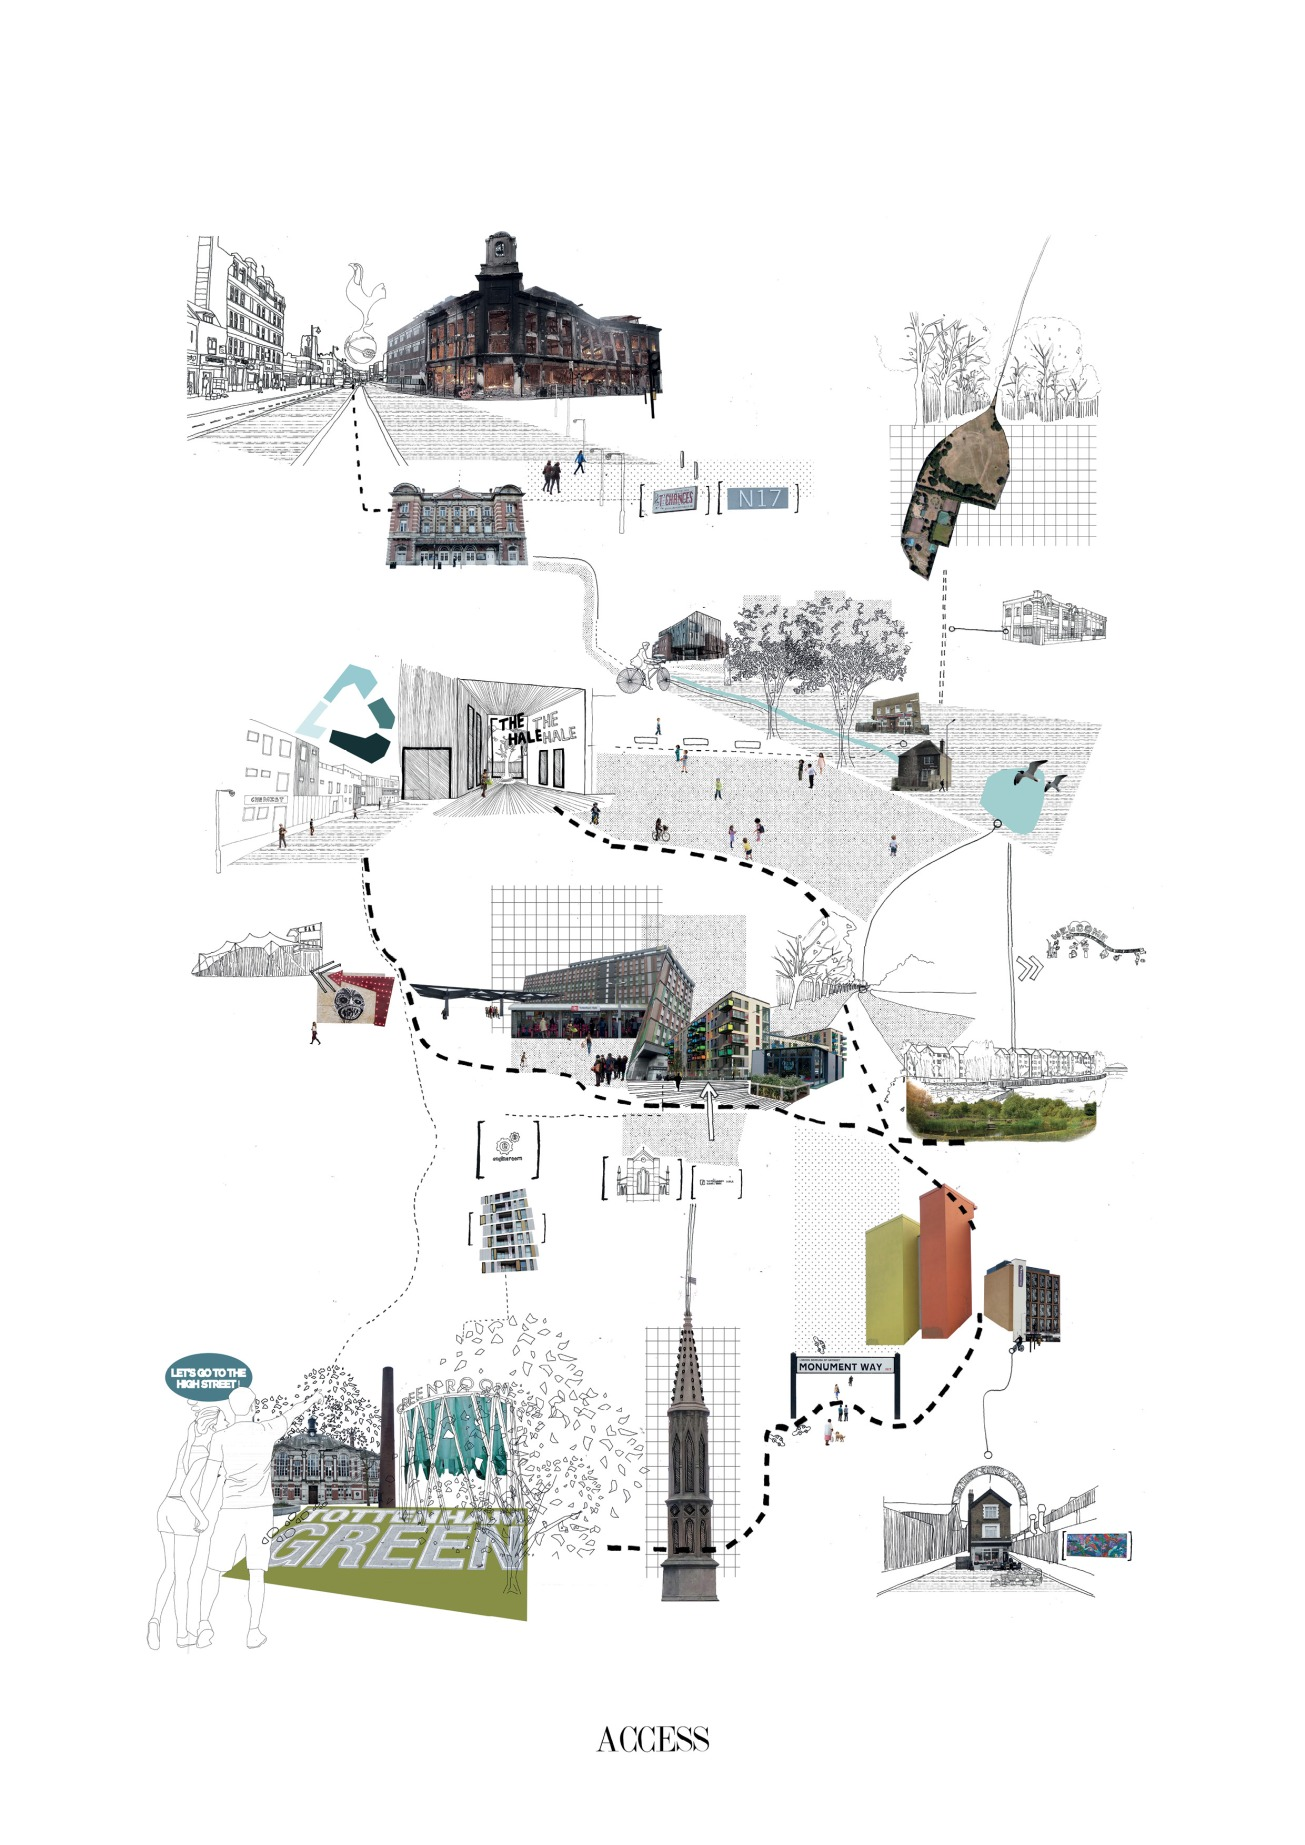 04. Tottenham Mindmap, Chen Man, Thesis Project (Final Year Masters, University of Nottingham)